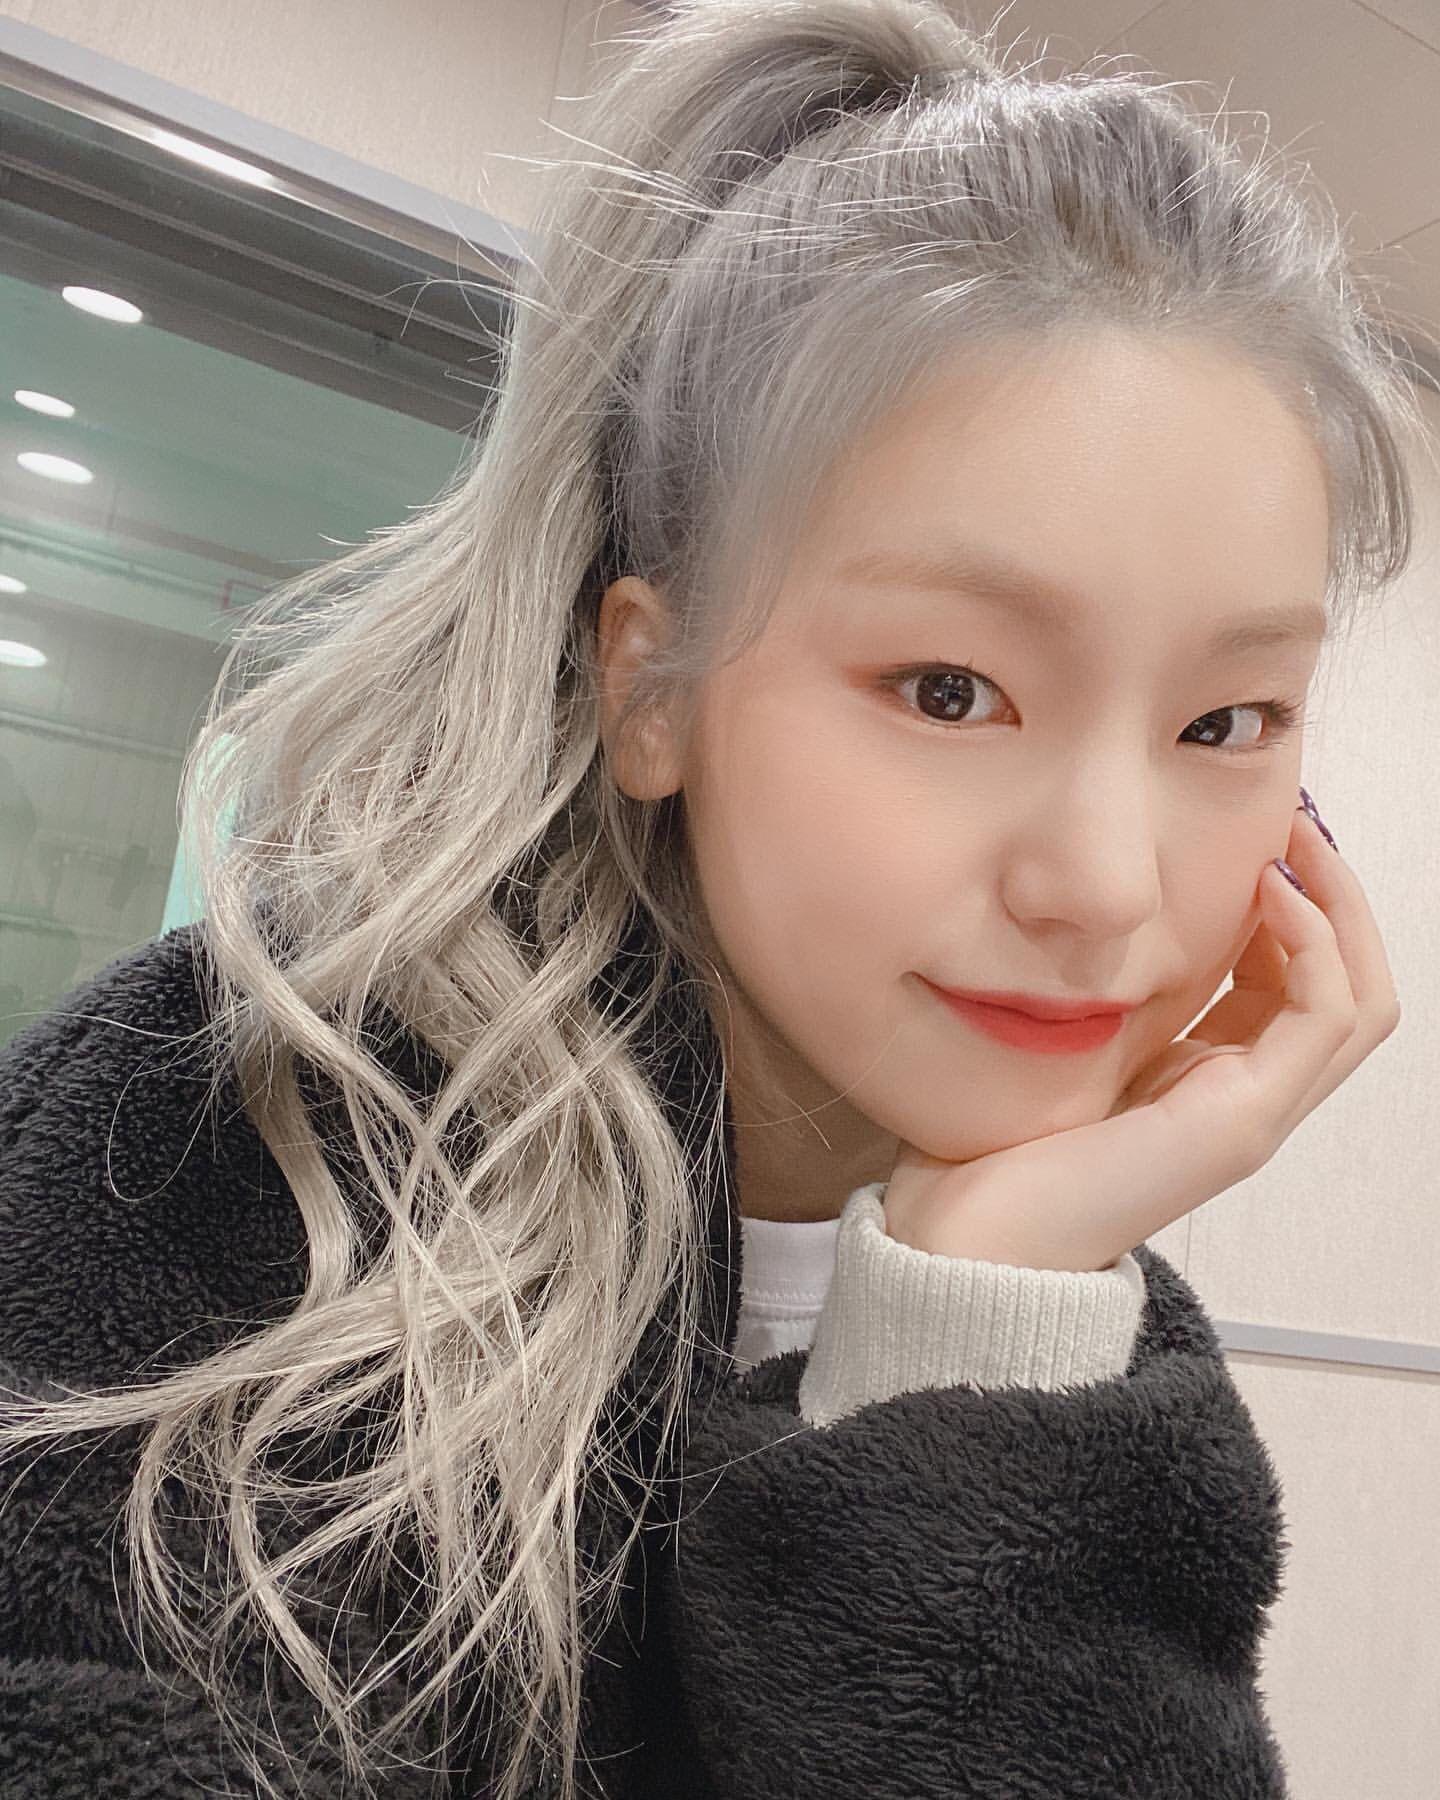 F A N C Y O L I V E On Twitter Itzy Silver Hair Silver Hair Girl